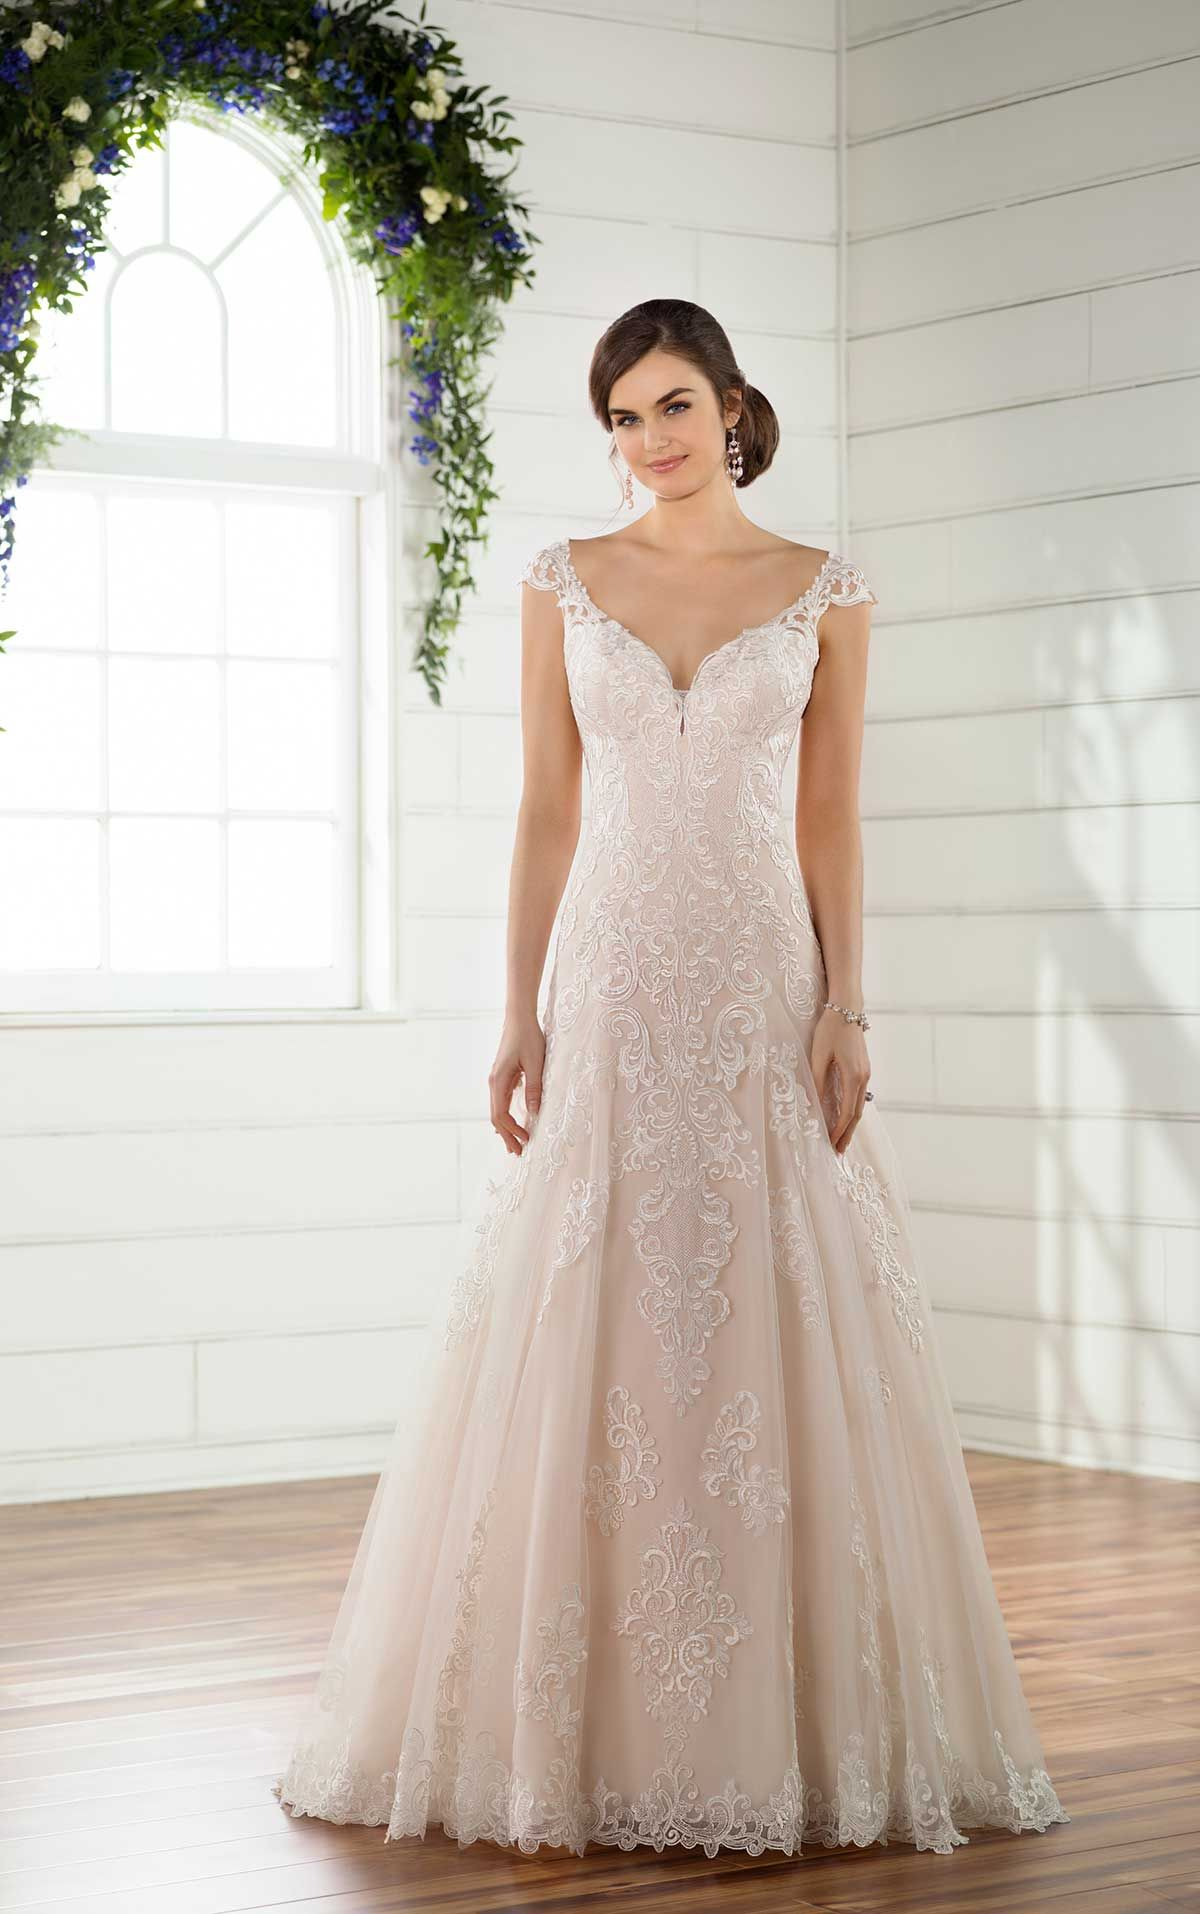 Lace cap sleeve a line wedding dress  Classic ALine Wedding Dress  Tulle gown Gowns and Wedding dress